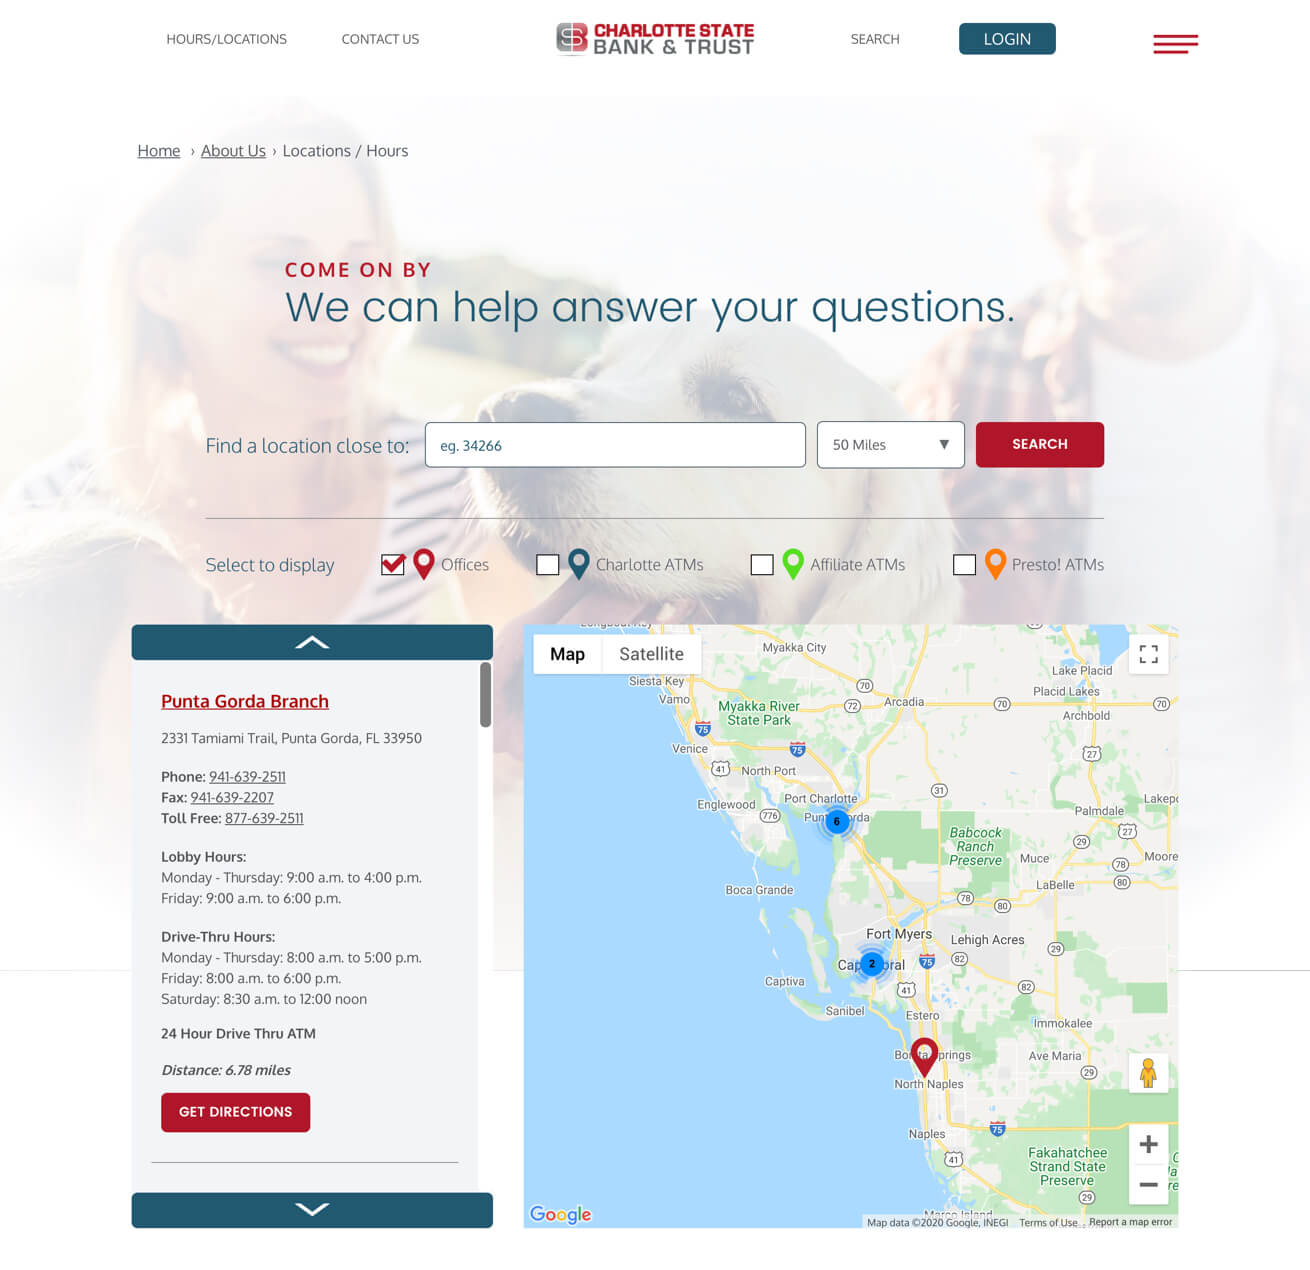 Crews Bank Corp Interactive Map Desktop View